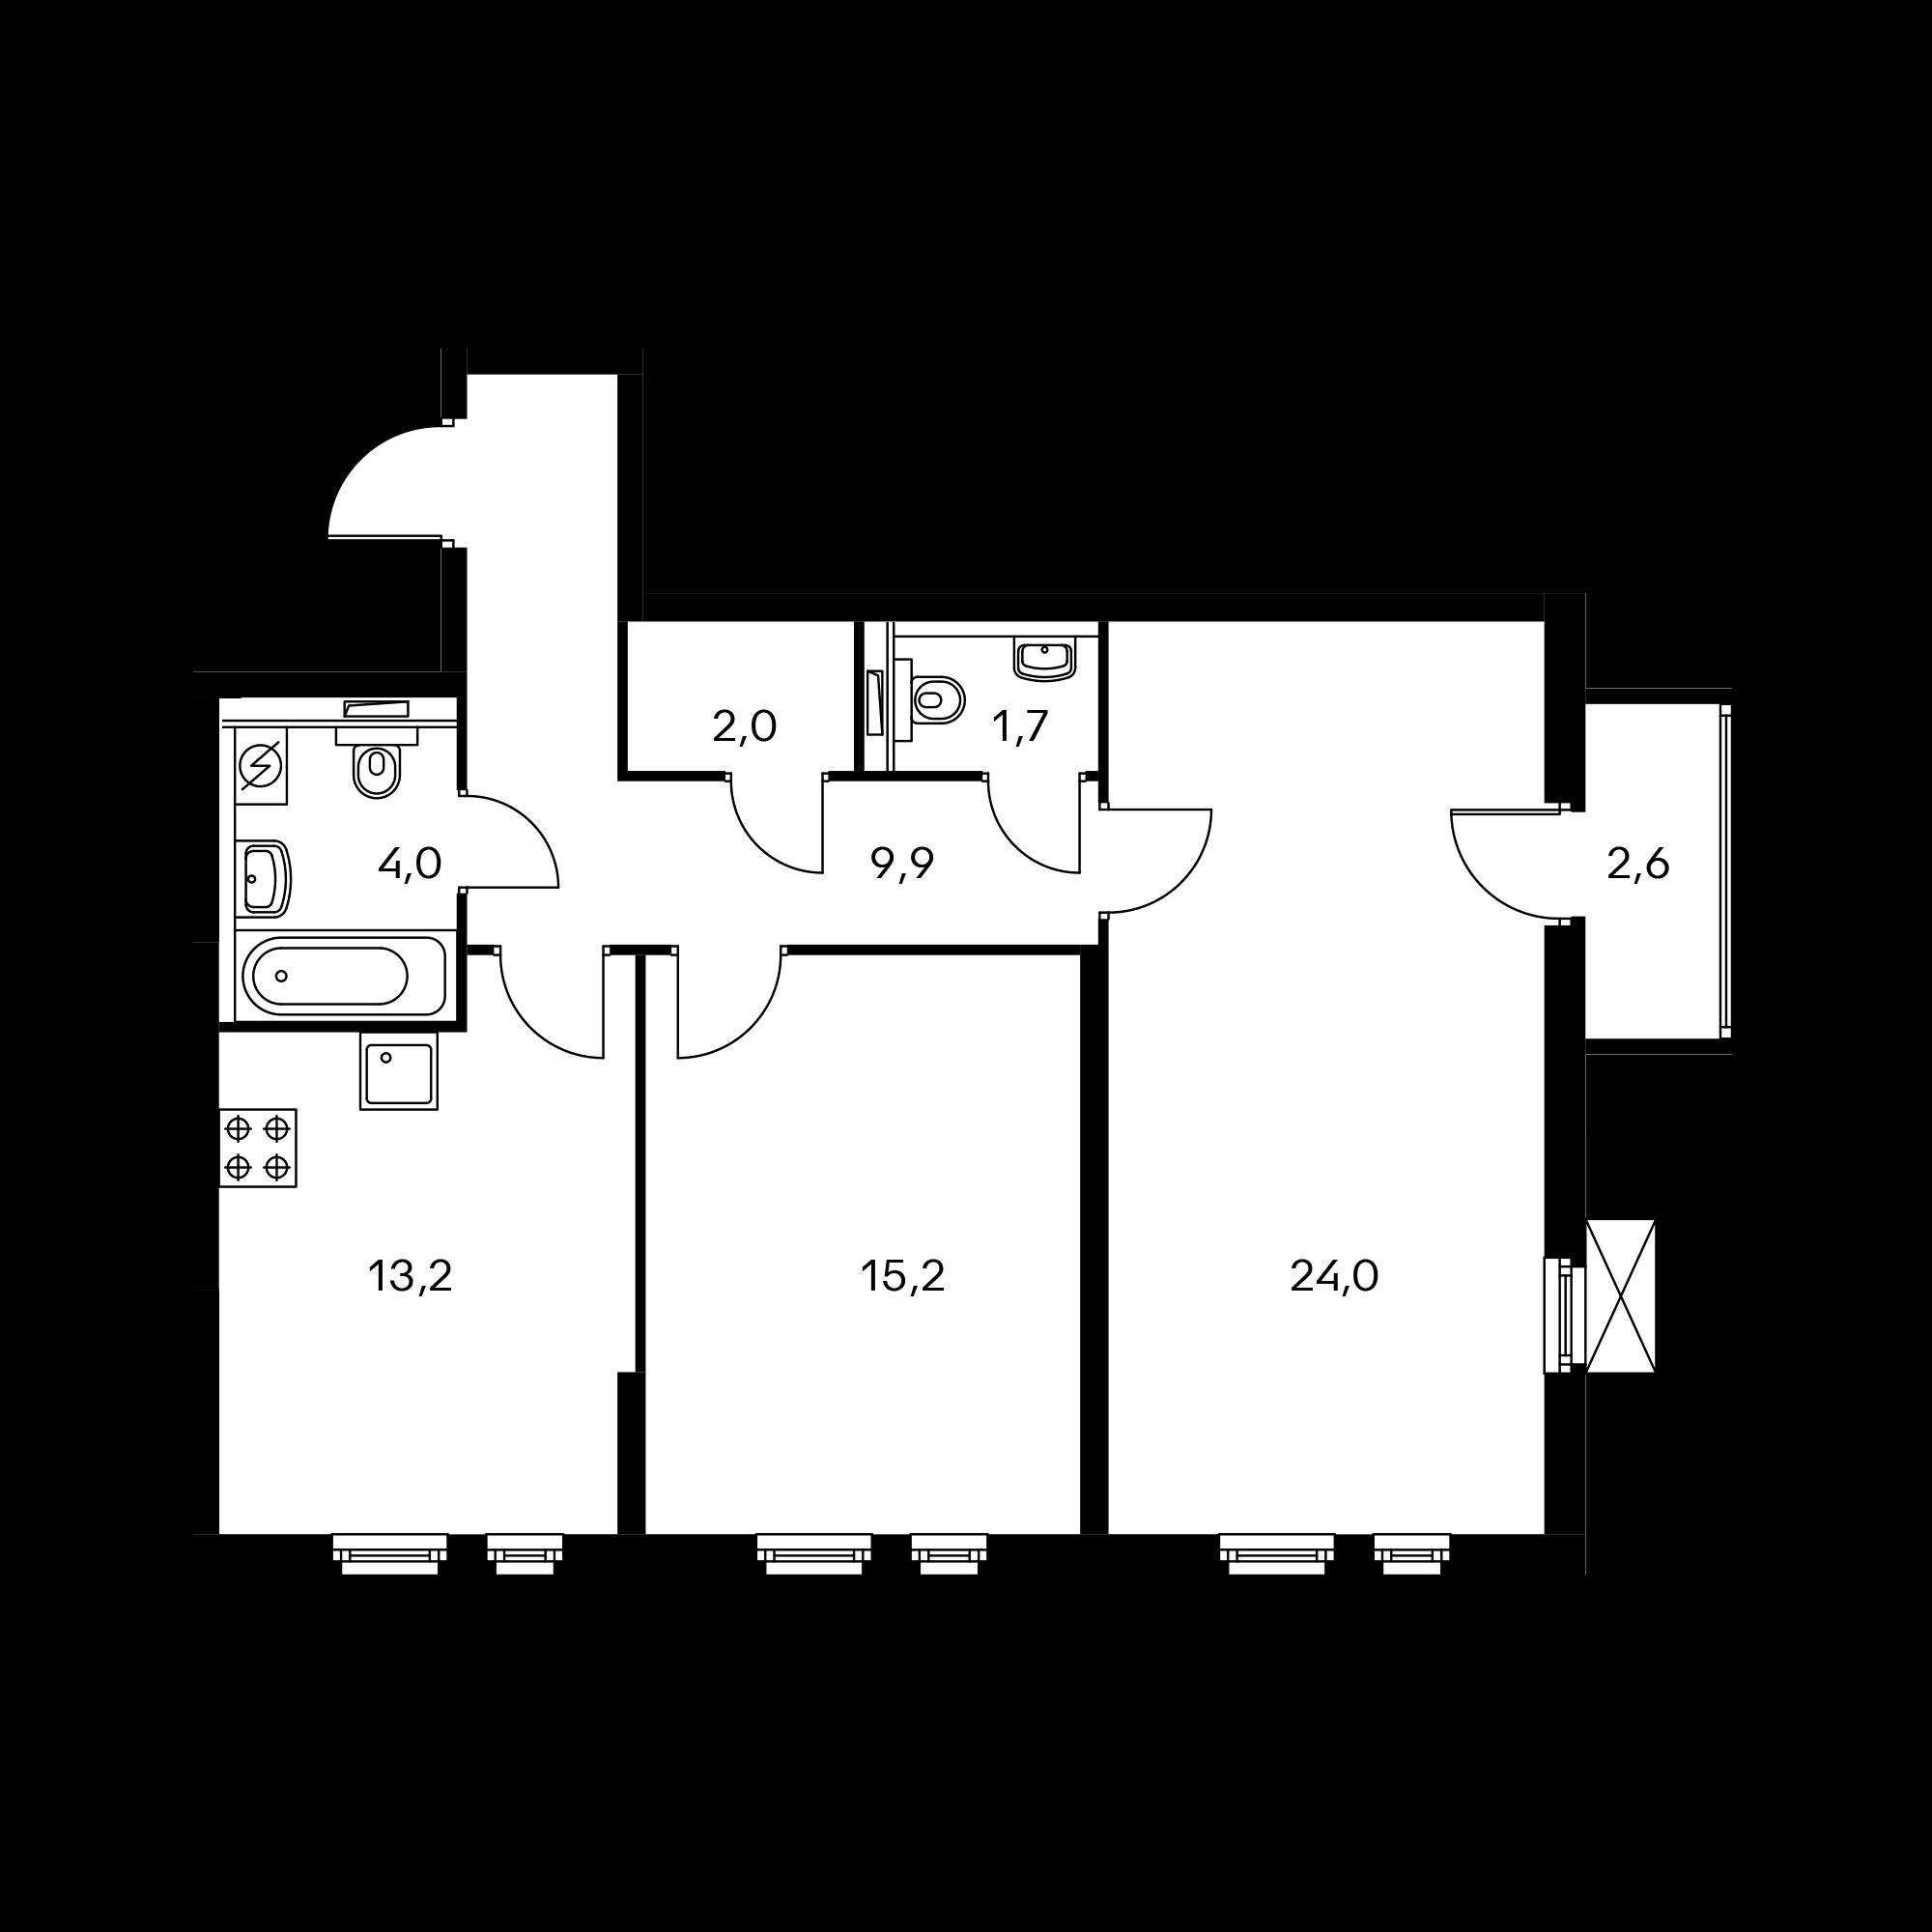 2KL1B-1_SZ1